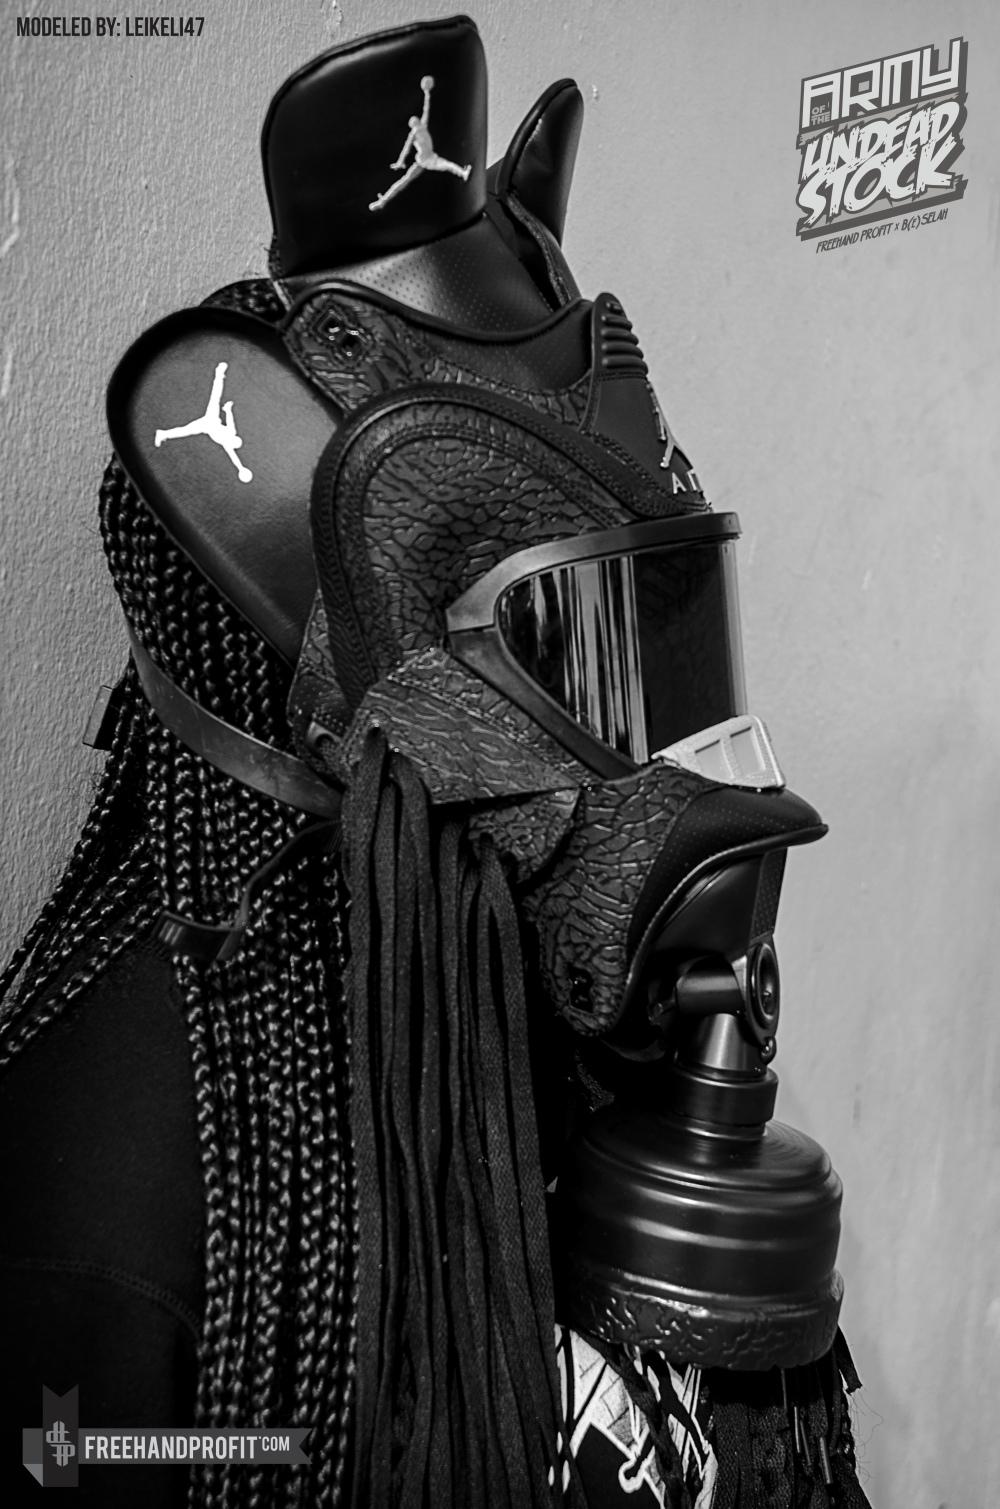 Black Flip 3 Jordan Gas Mask